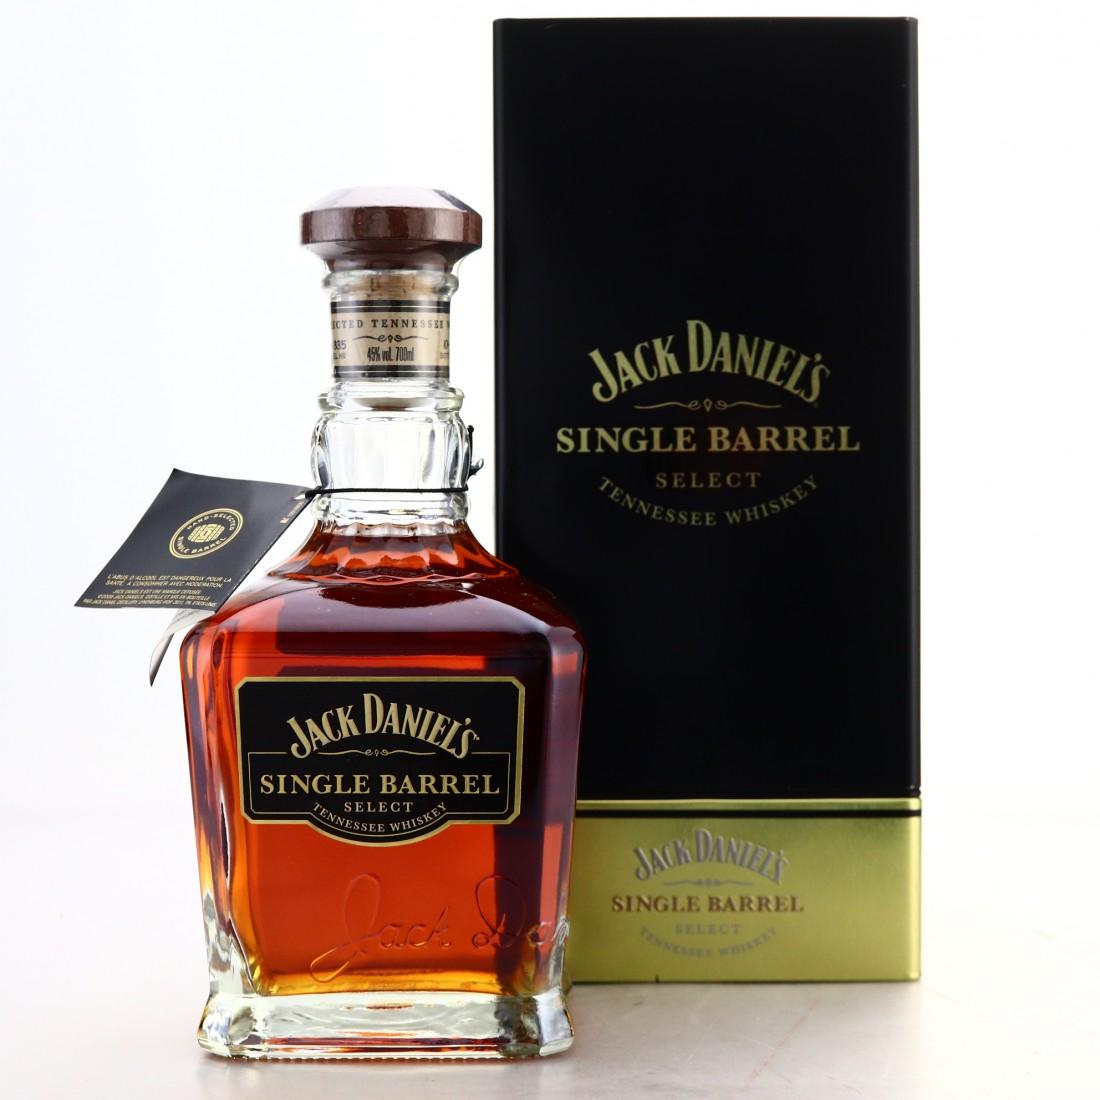 Jack Daniel's Single Barrel Select 2010